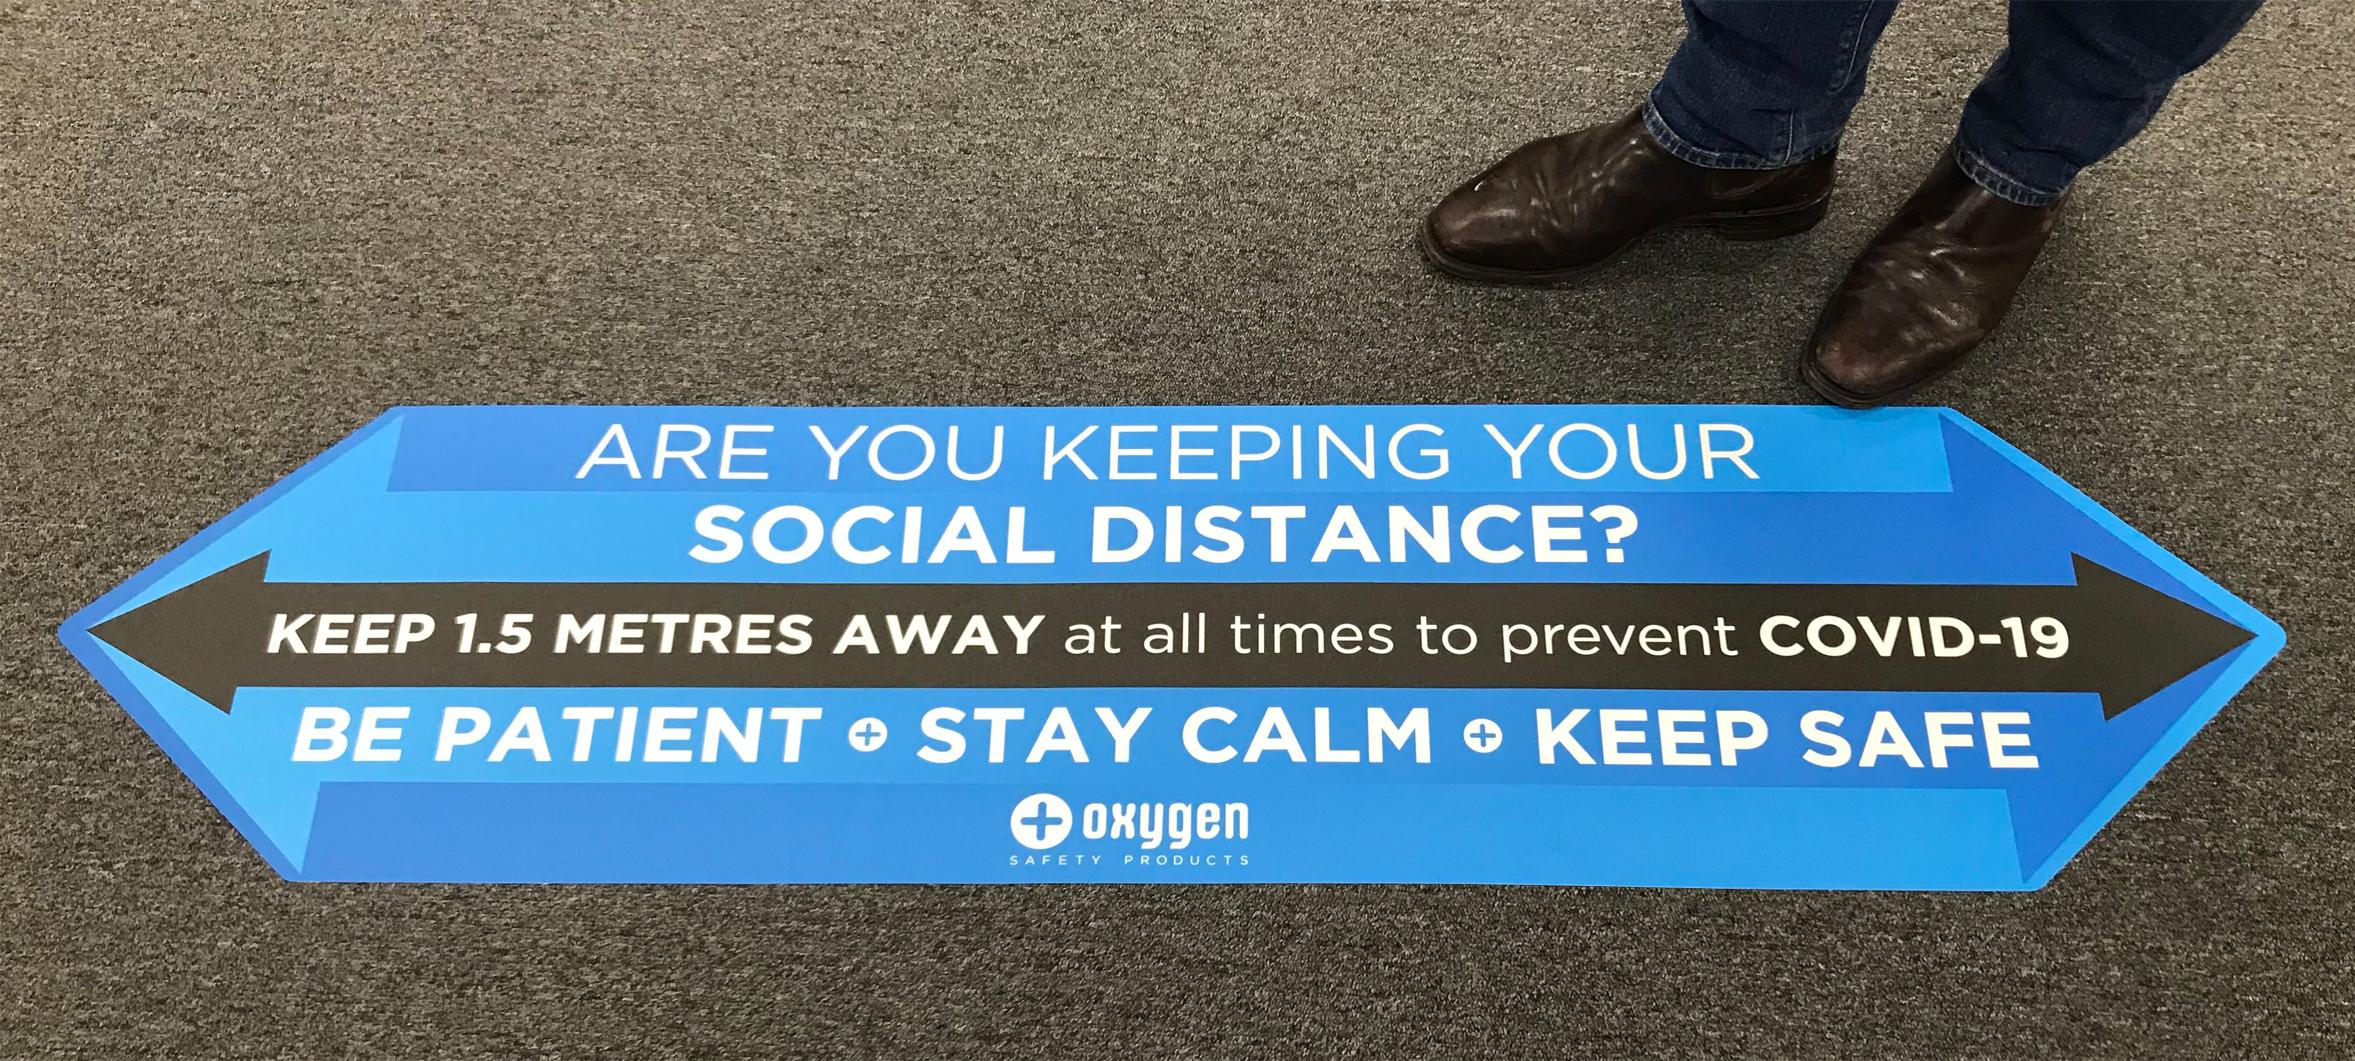 Social Distance Grip Grafix